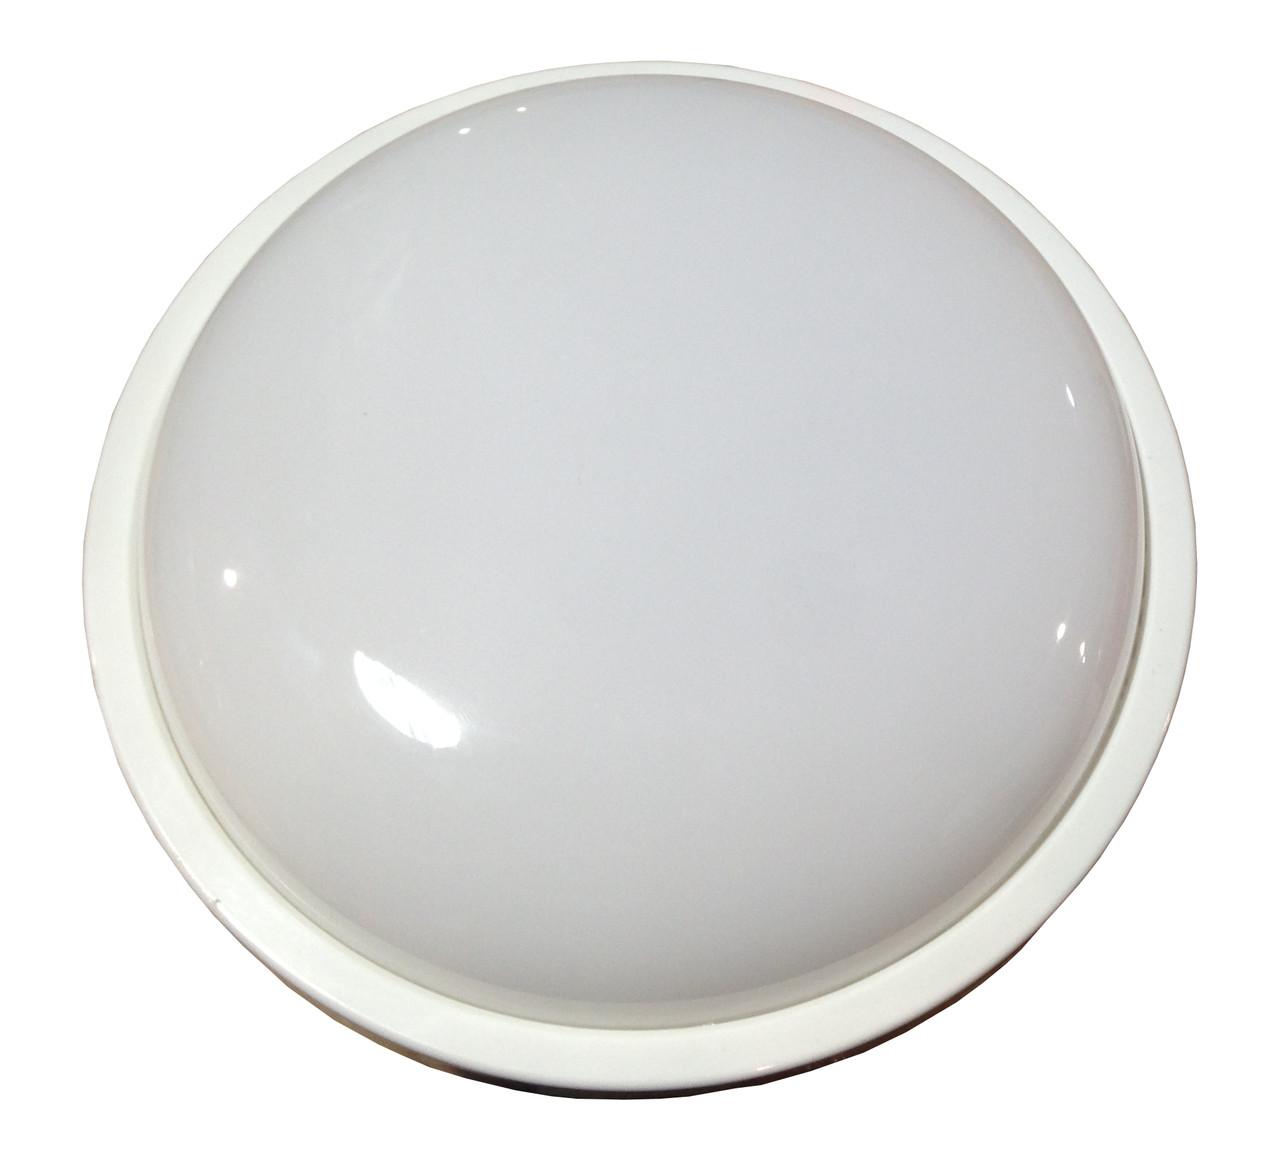 Влагозащищенный LED светильник для ЖКХ круг 20W 6000K IP54 LU-WR-20C (218*70мм) ТМ LUMANO